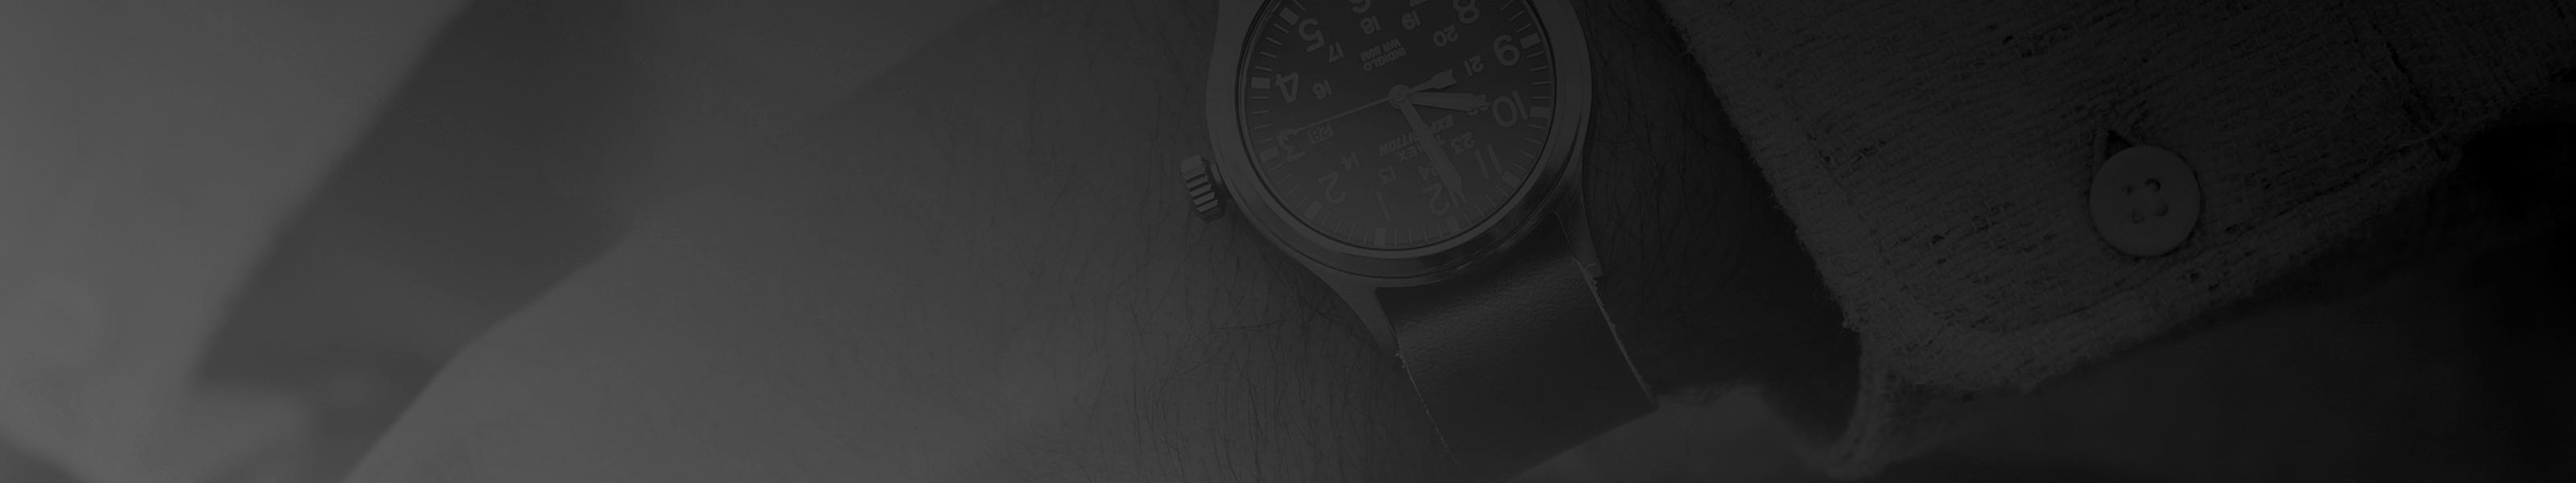 Bf watch header.jpg?ixlib=rails 2.1